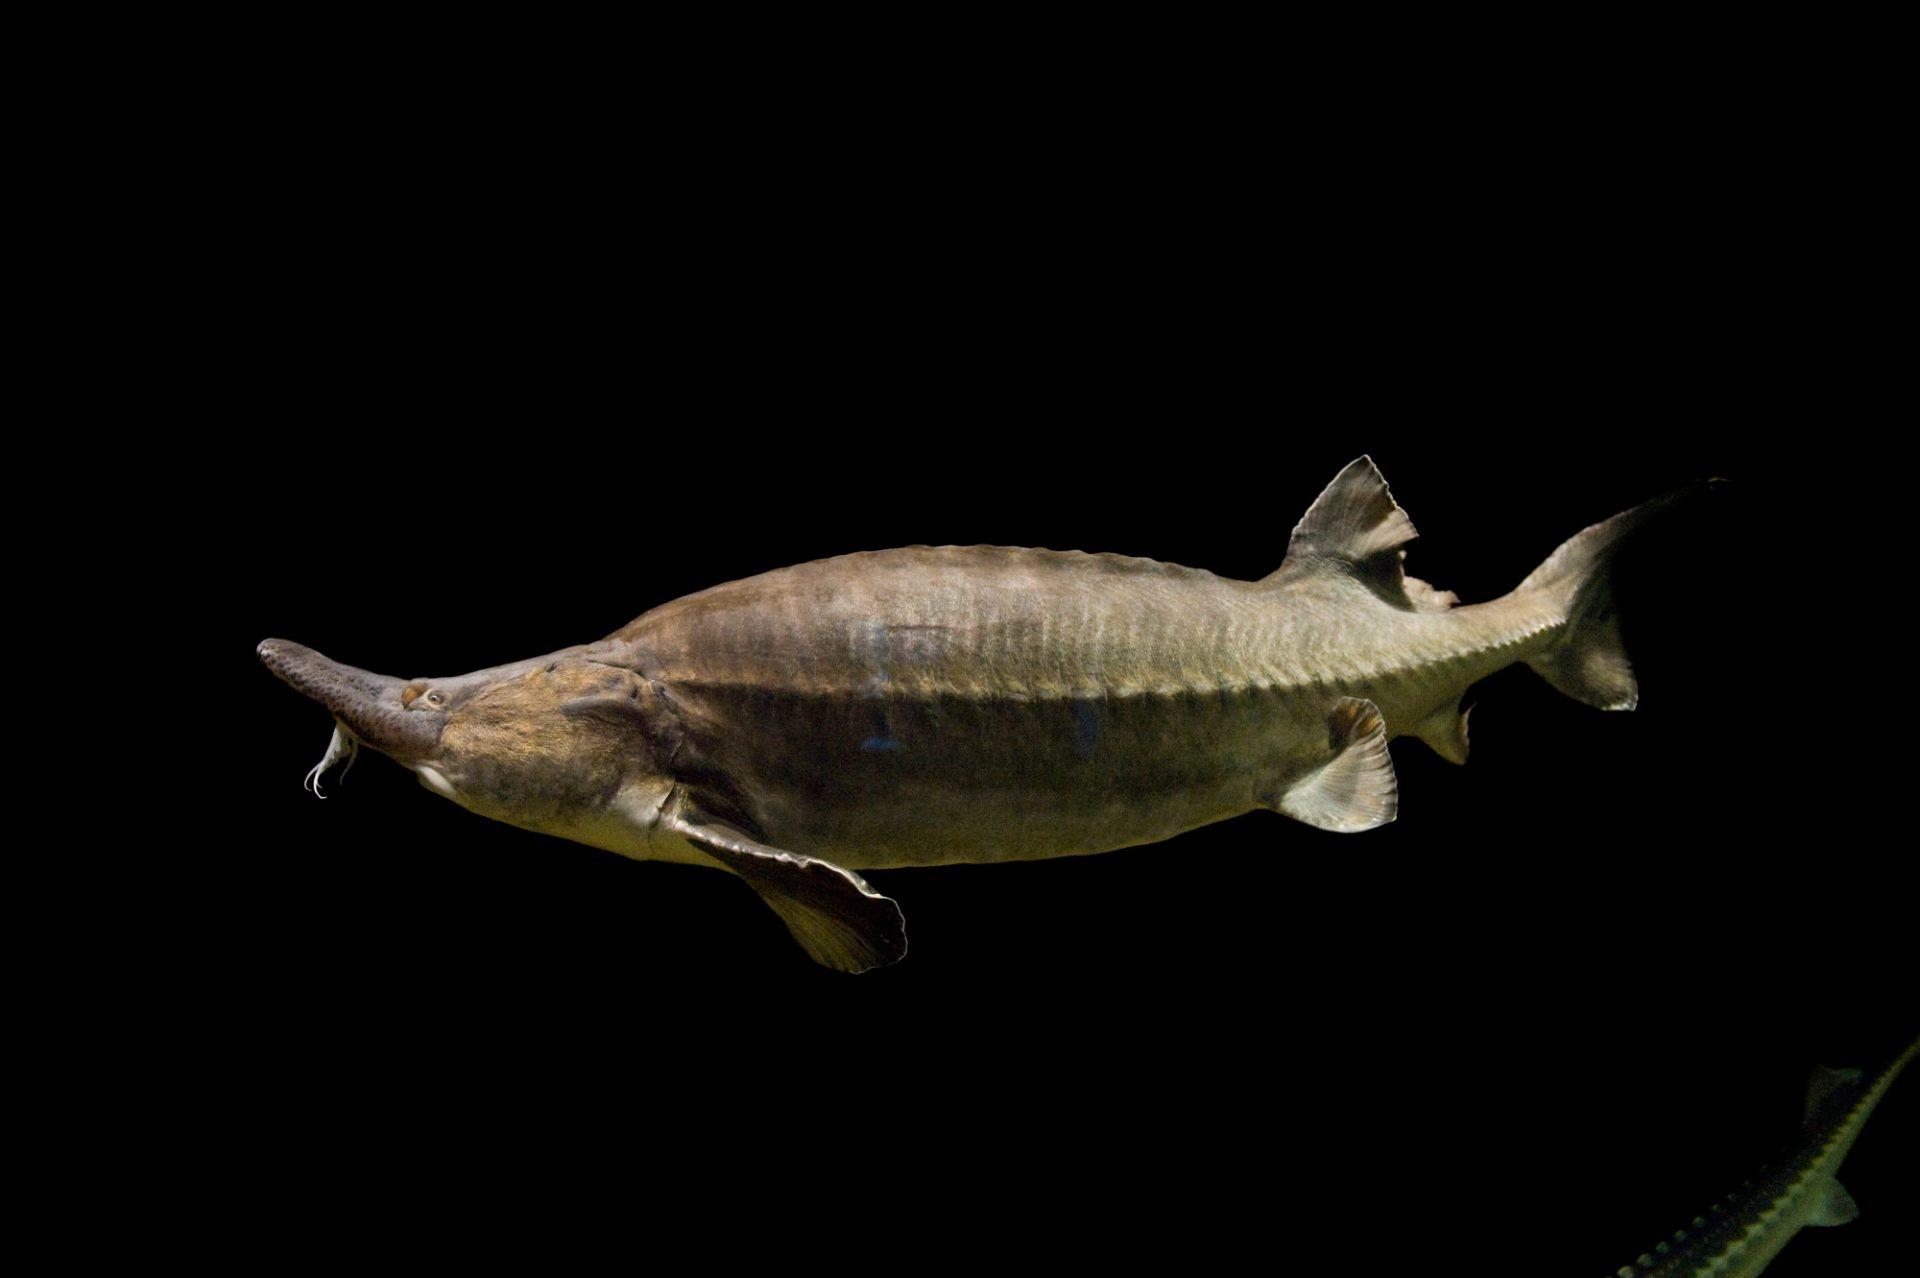 A critically endangered (IUCN) and federally threatened beluga sturgeon (Huso huso).